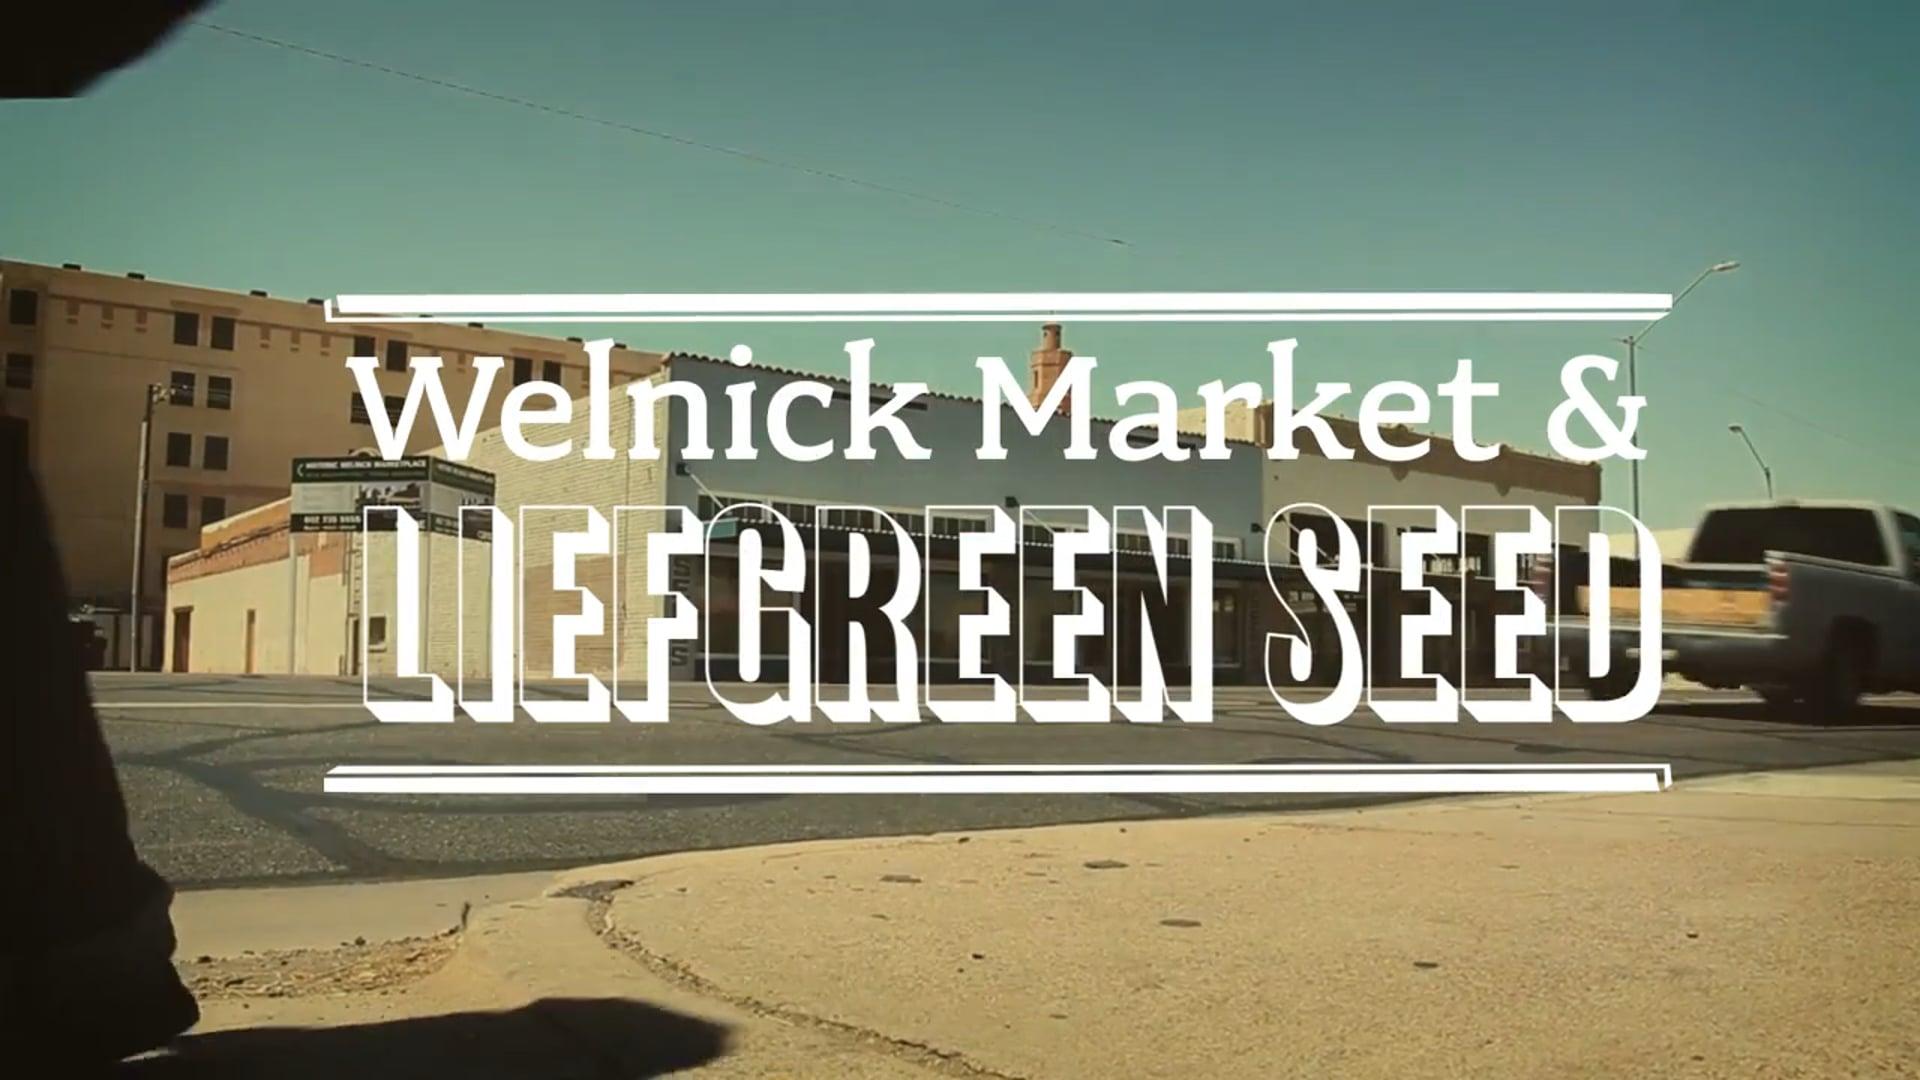 Welnick Marketplace